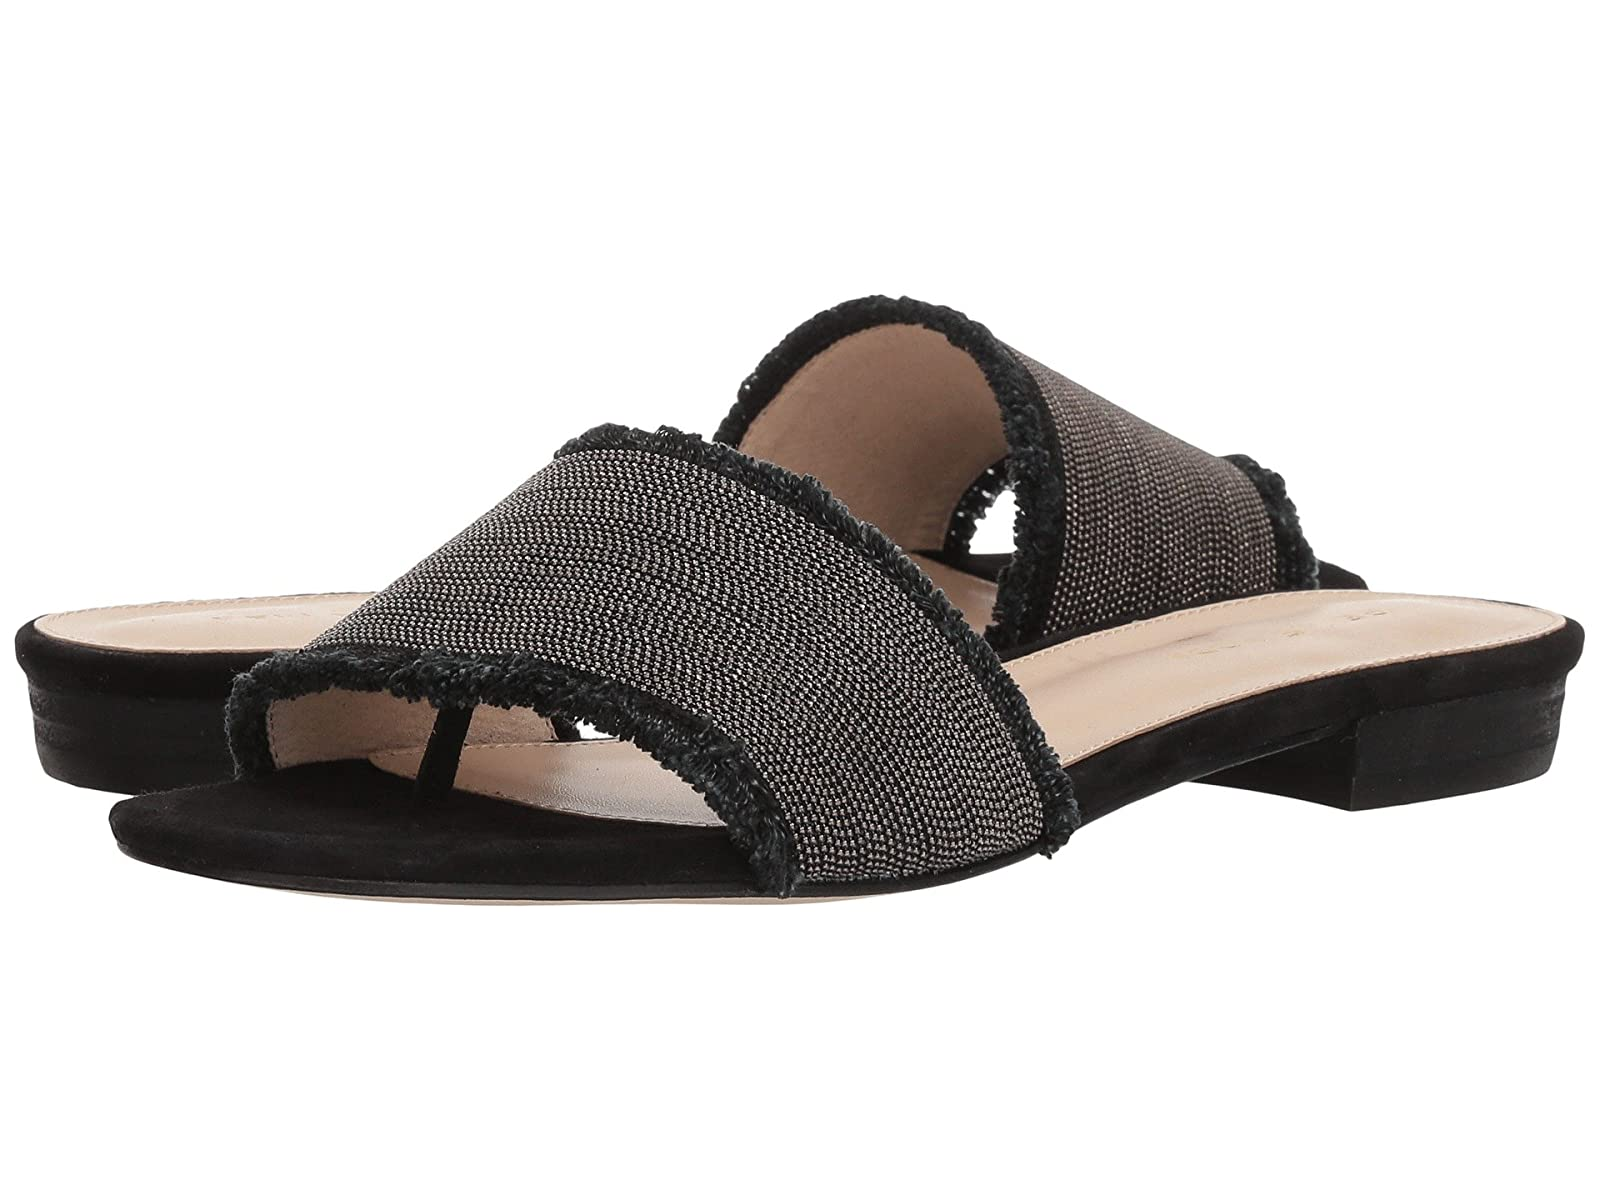 Pelle Moda BayerAtmospheric grades have affordable shoes